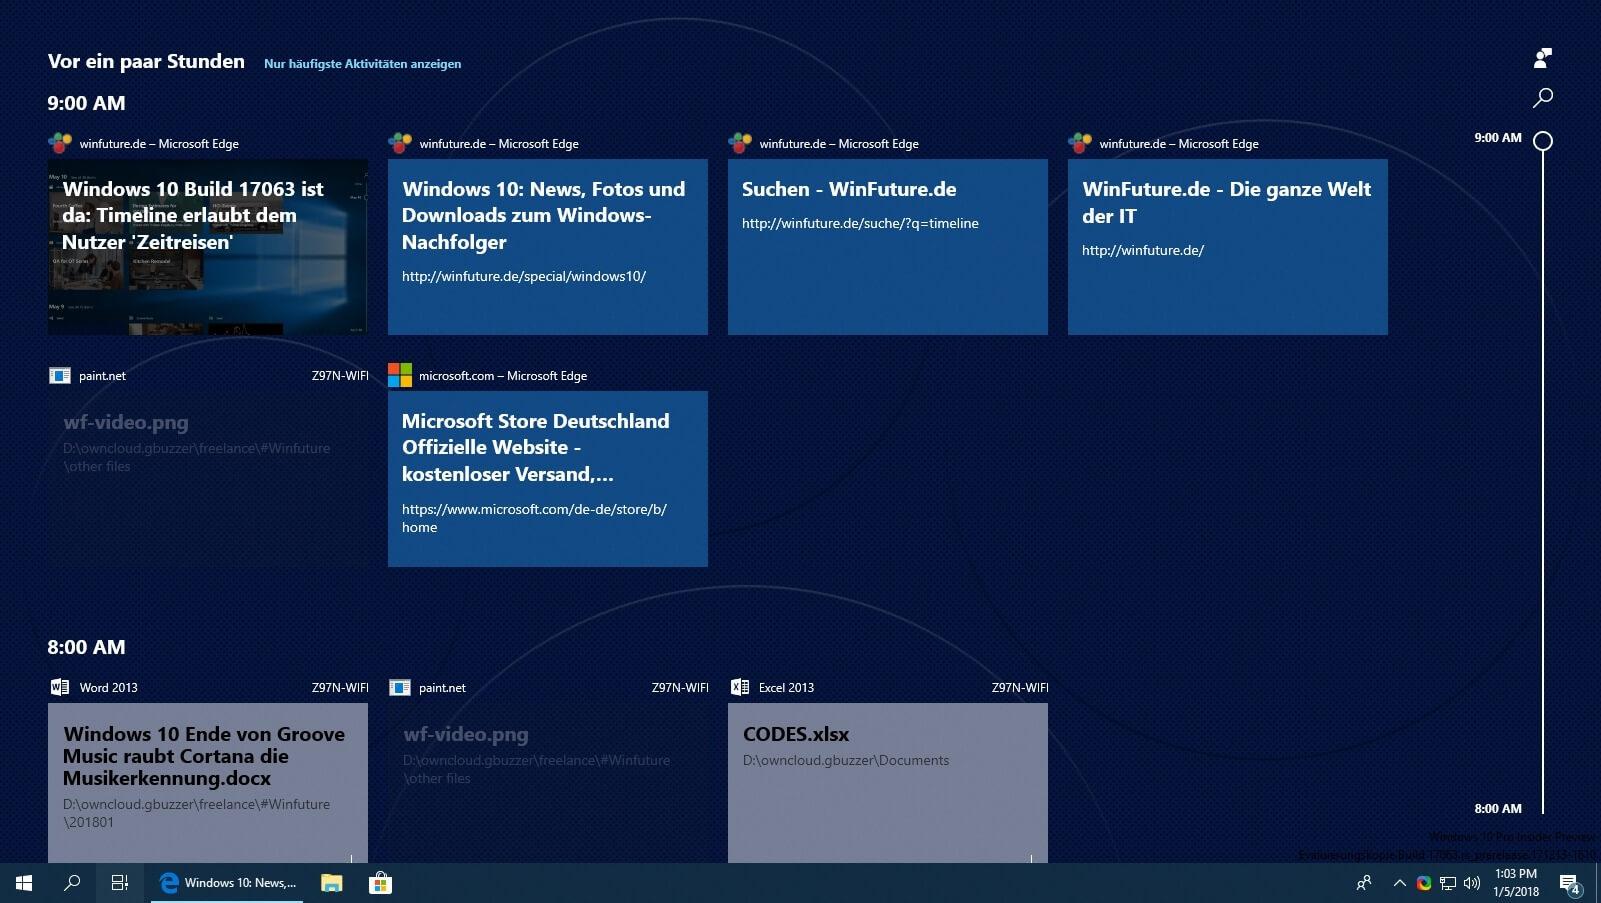 Windows 10 Build 17063 - Timeline